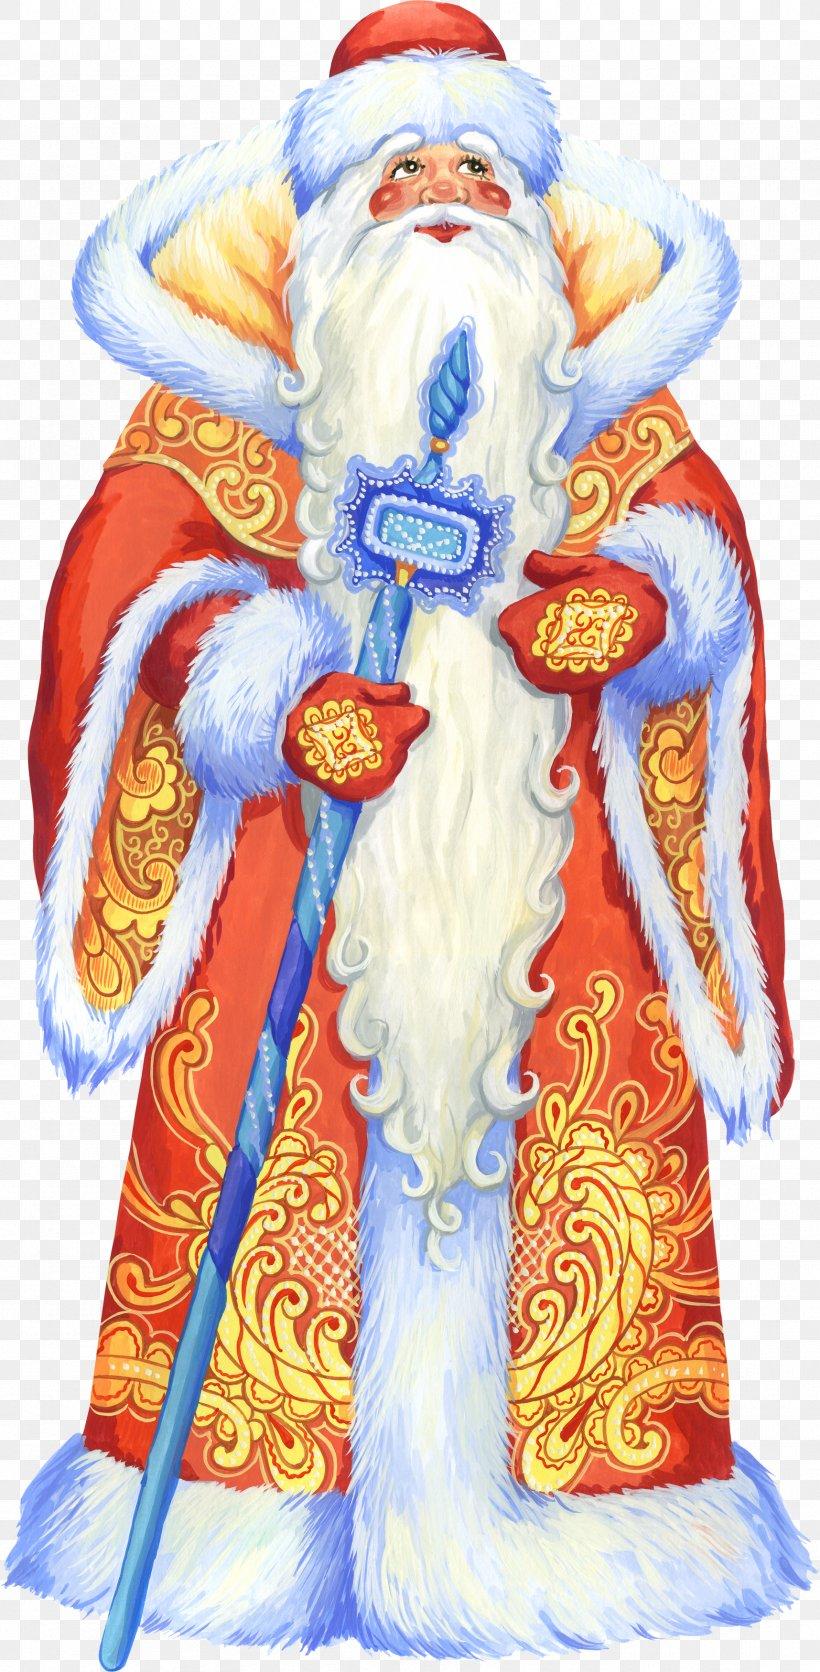 Ded Moroz Snegurochka Santa Claus Christmas Clip Art, PNG, 1716x3500px, Ded Moroz, Art, Christmas, Christmas And Holiday Season, Christmas Ornament Download Free